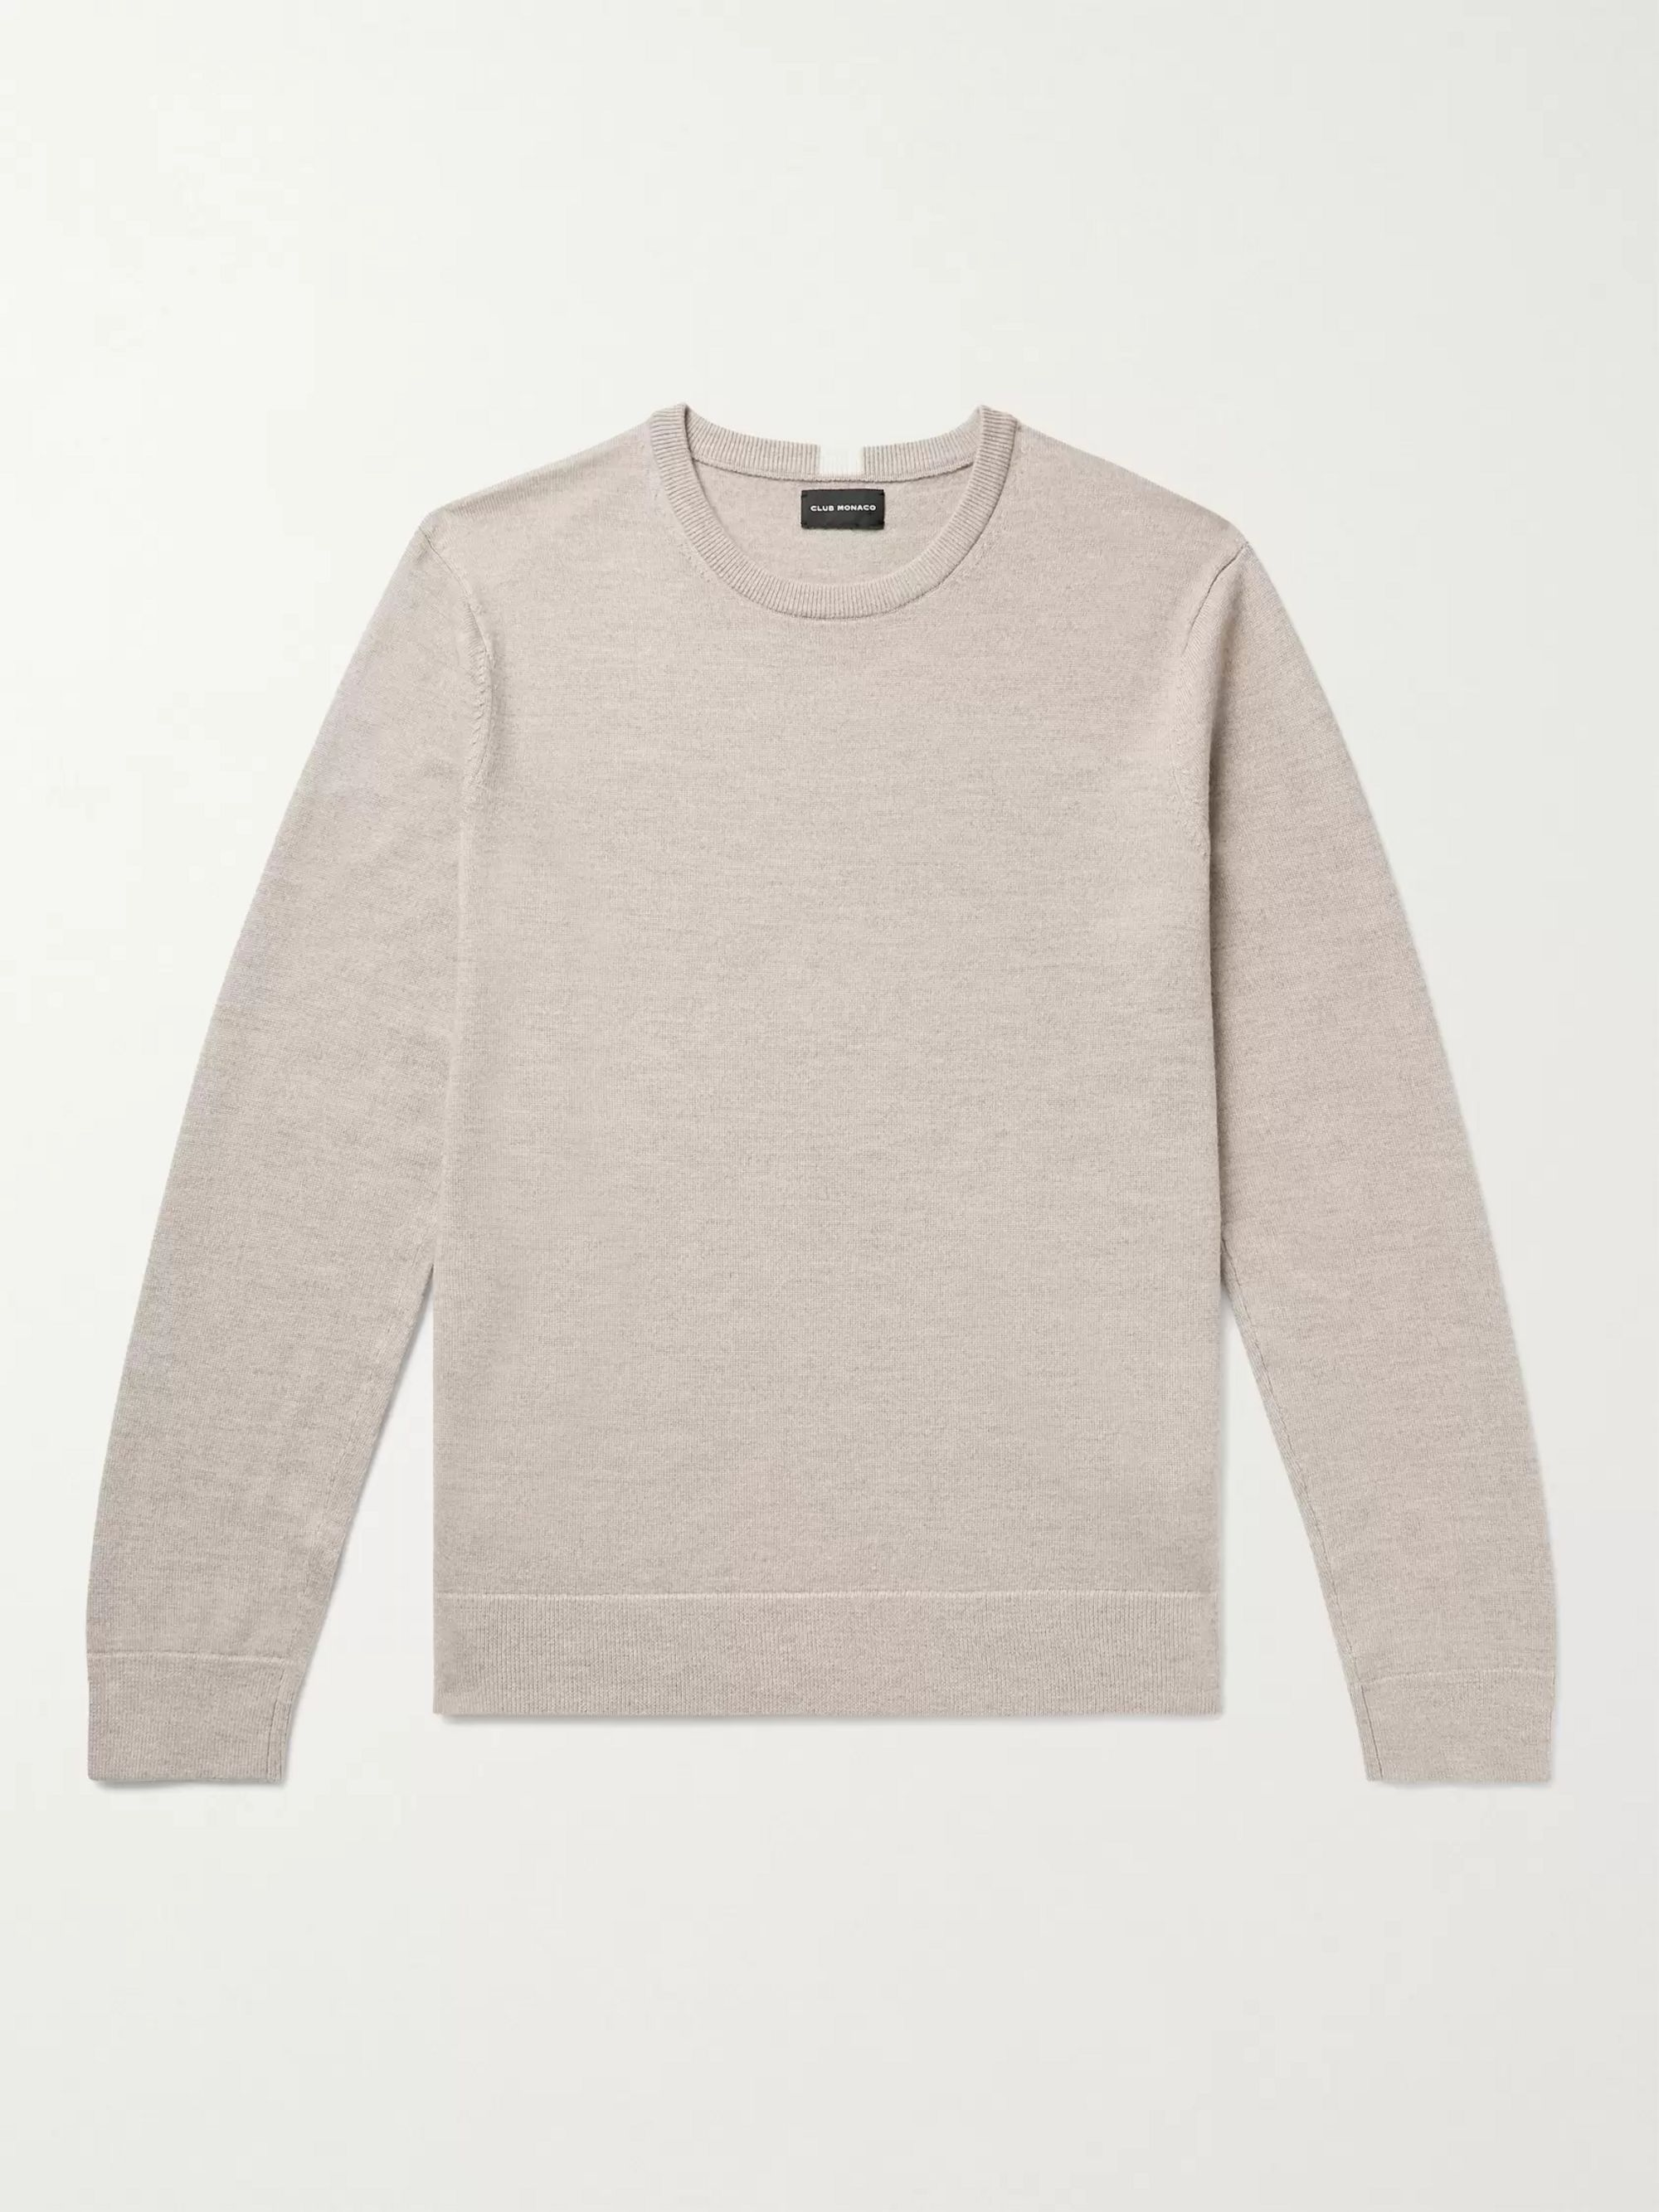 CLUB MONACO Melange Wool Sweater